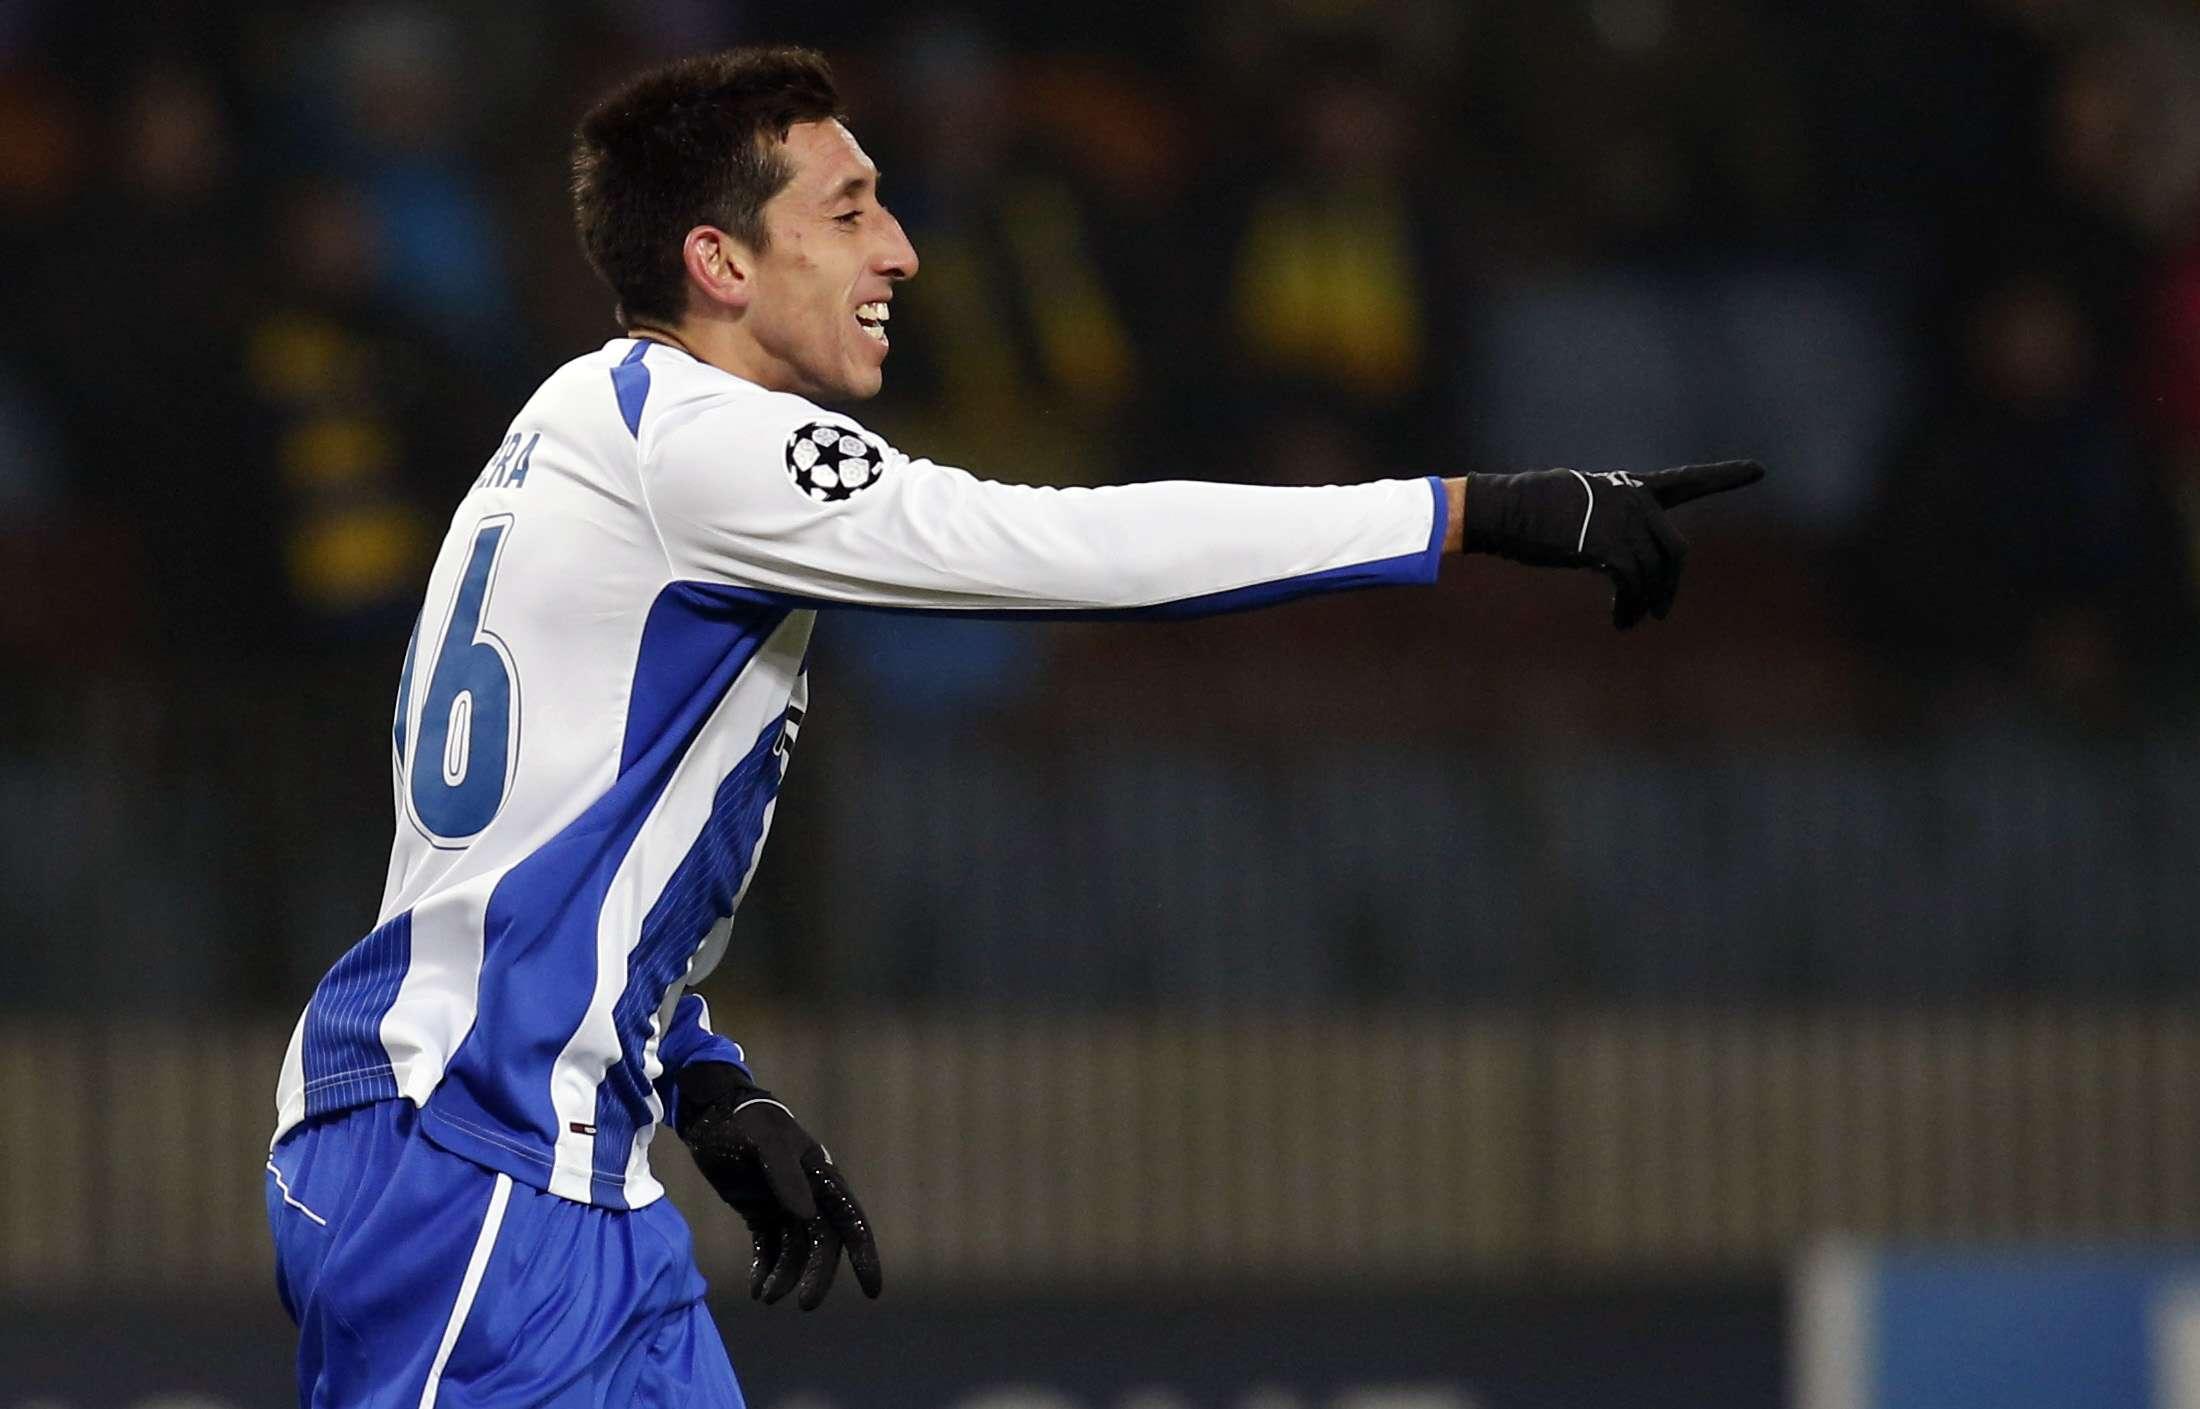 Hector Herrera comemora seu gol pelo Porto Foto: Vasily Fedosenko/Reuters